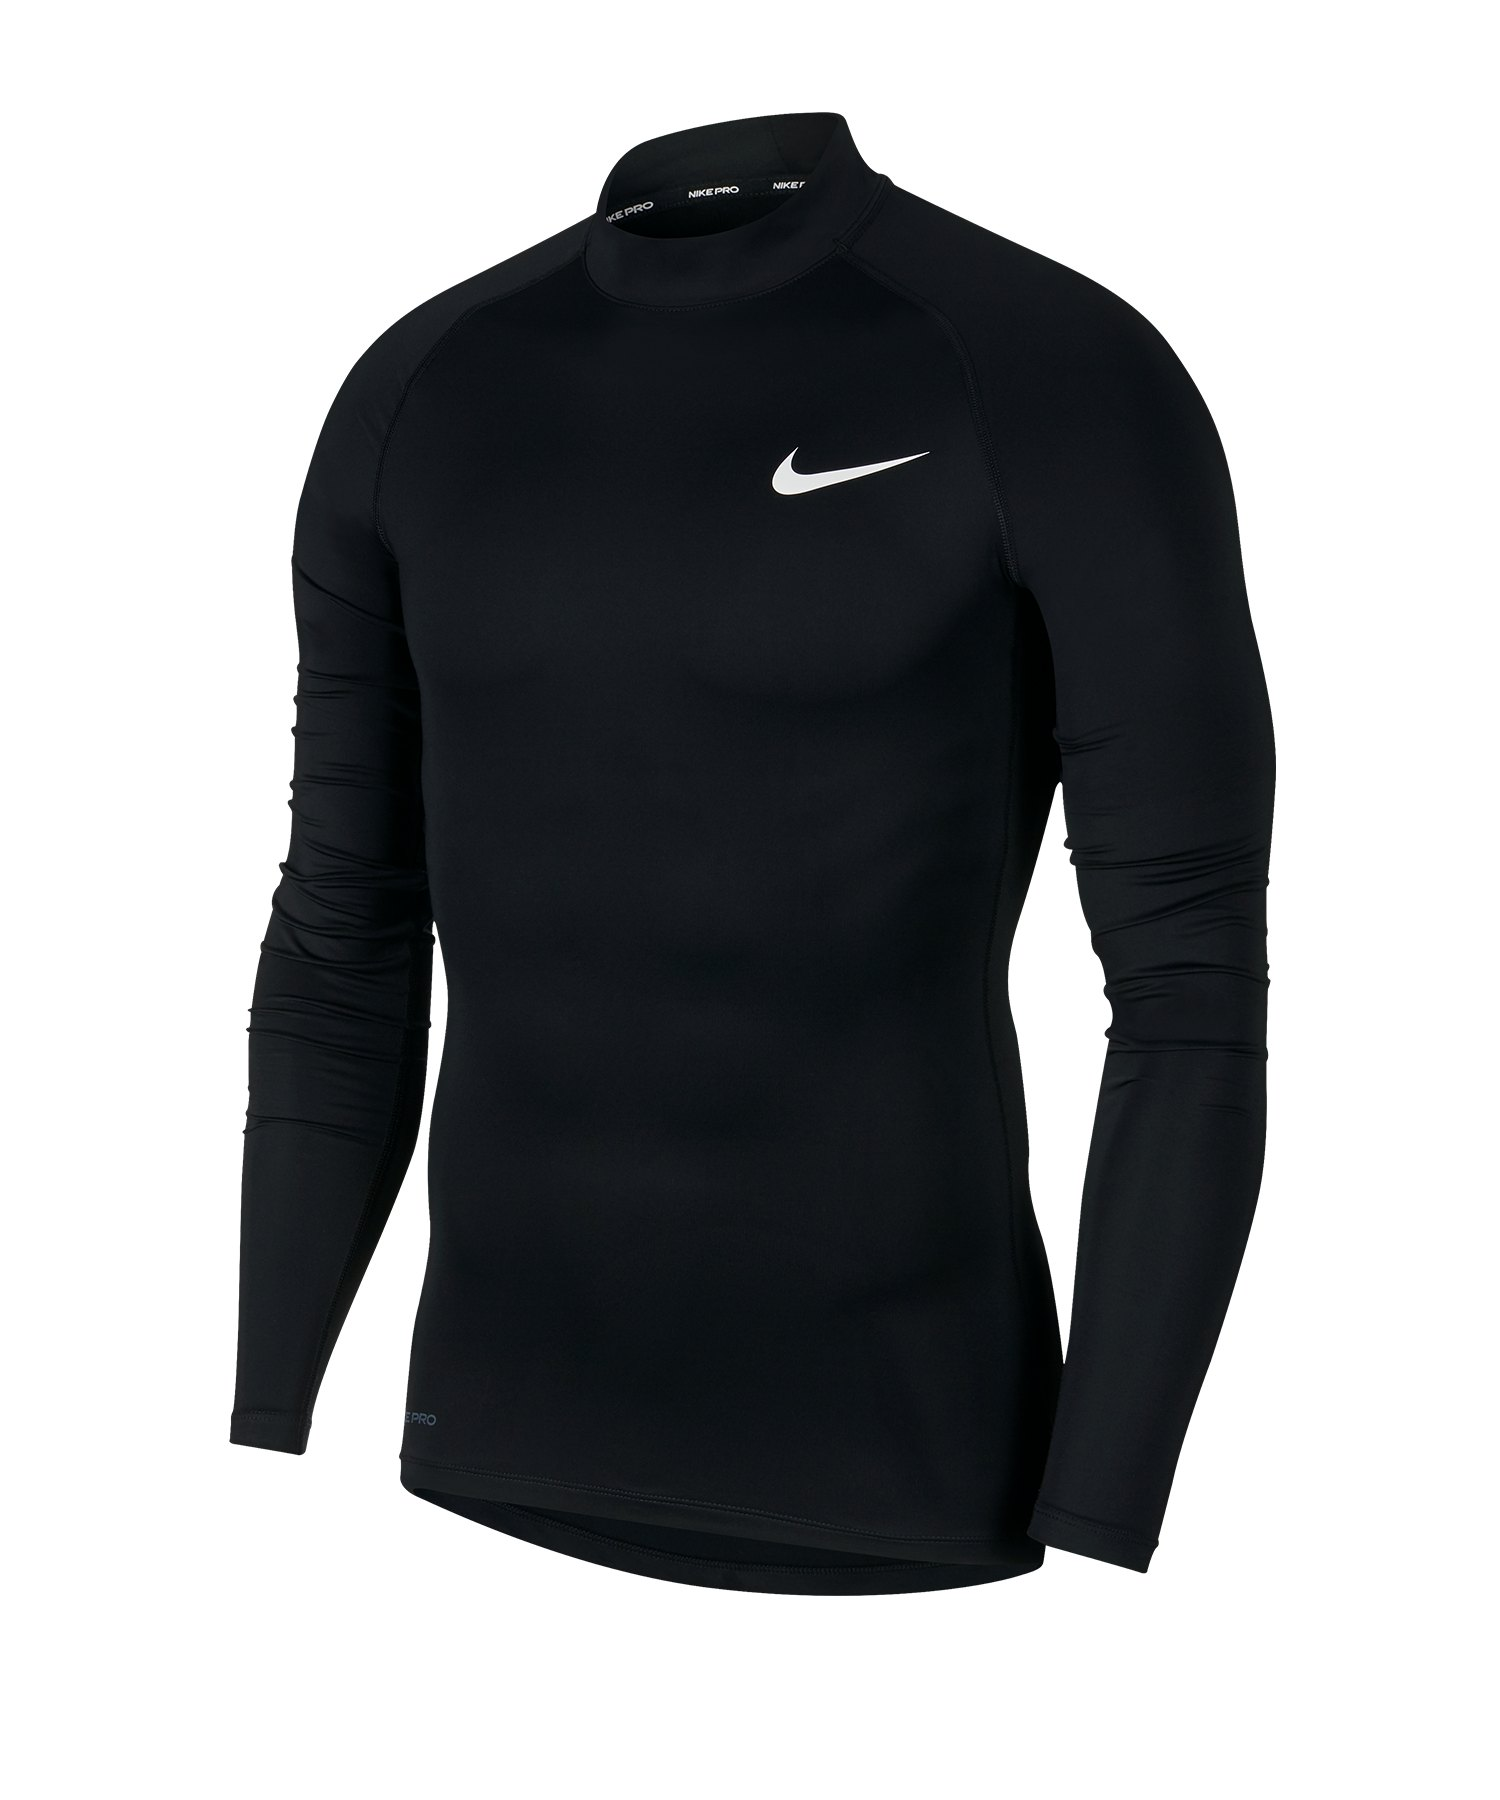 Nike Pro Training Top Mock langarm Schwarz F010 - schwarz